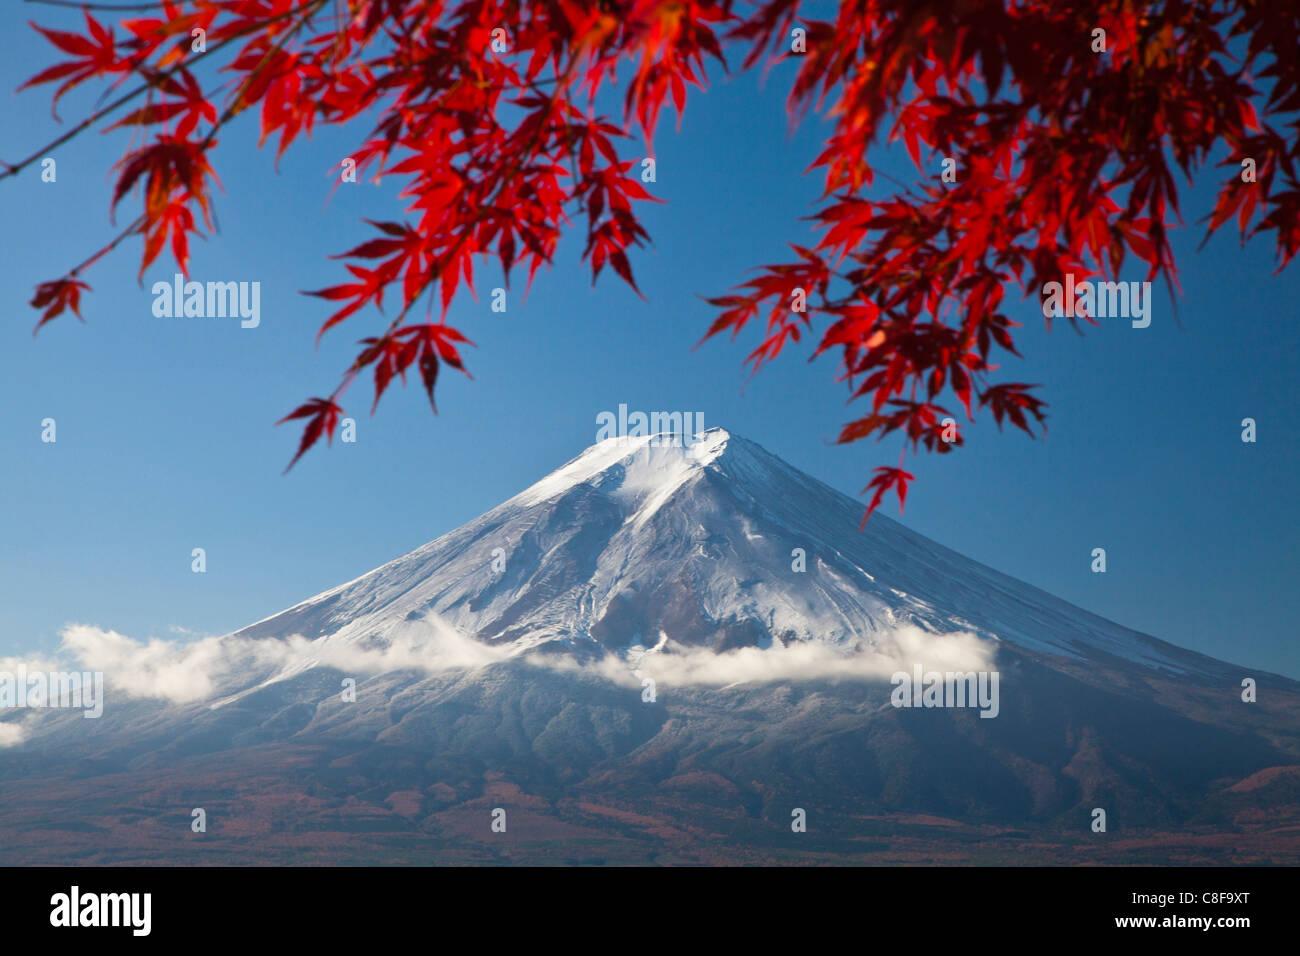 Japan, November, Asia, mountain Fuji, Fuji, maple, red, Japanese, maple, Momiji, snow, scenery Stock Photo